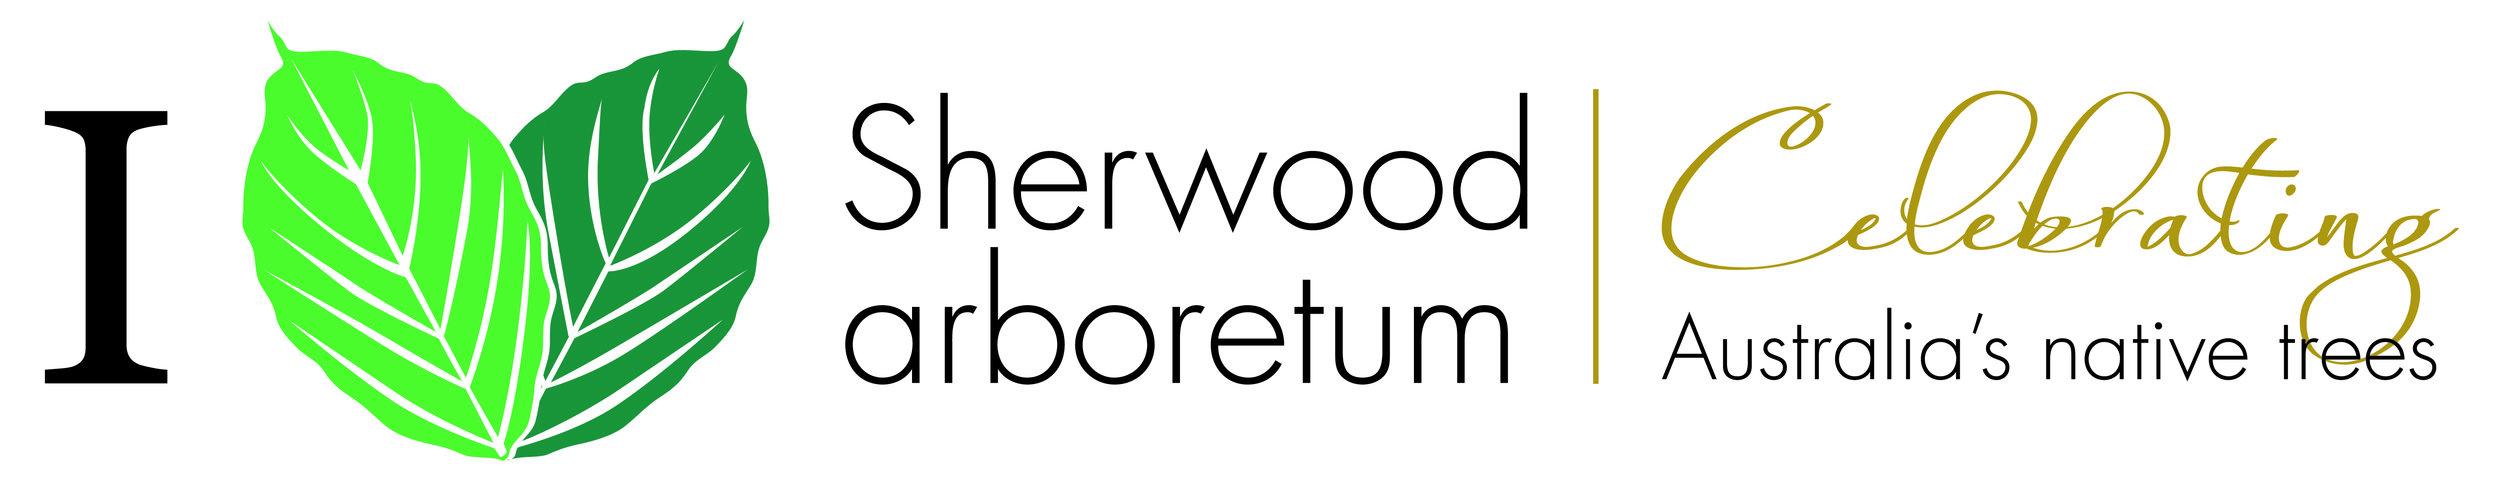 1-heart-Sherwood-Arboretum-Celebrating-native-logo-HR (2).jpg